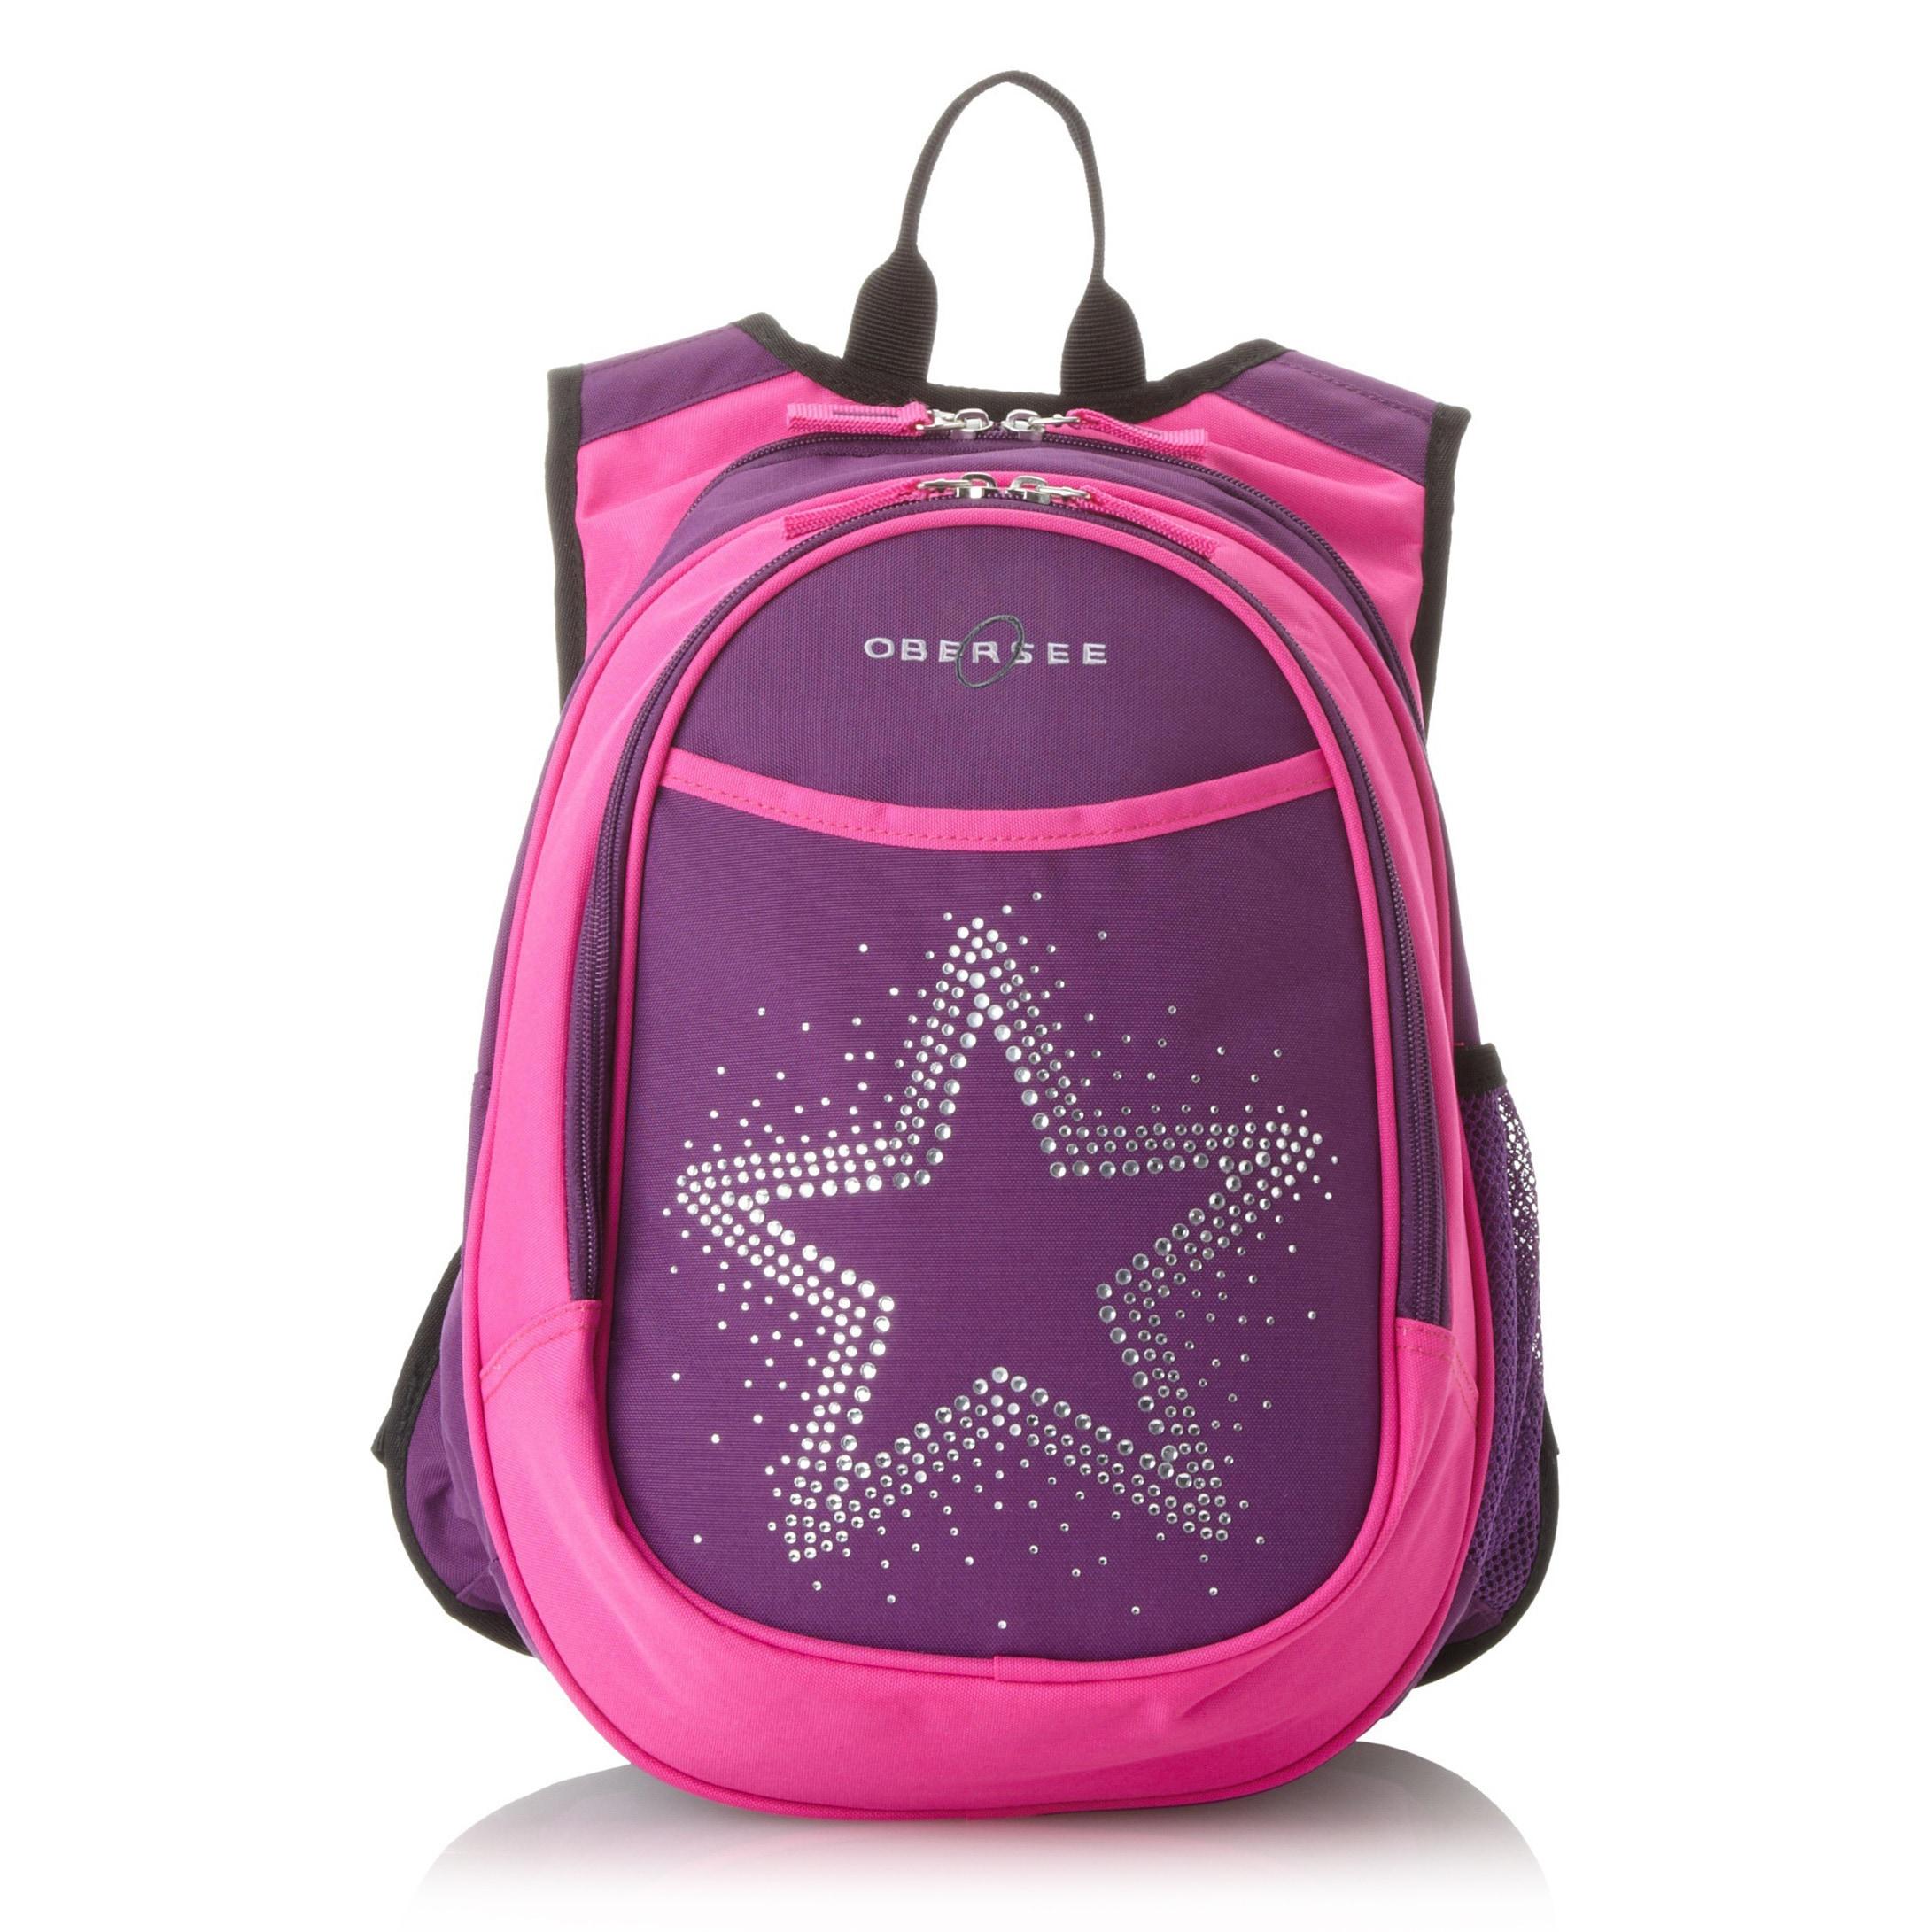 Obersee Kids Pre-School All-In-One Bling Rhinestone Star ...